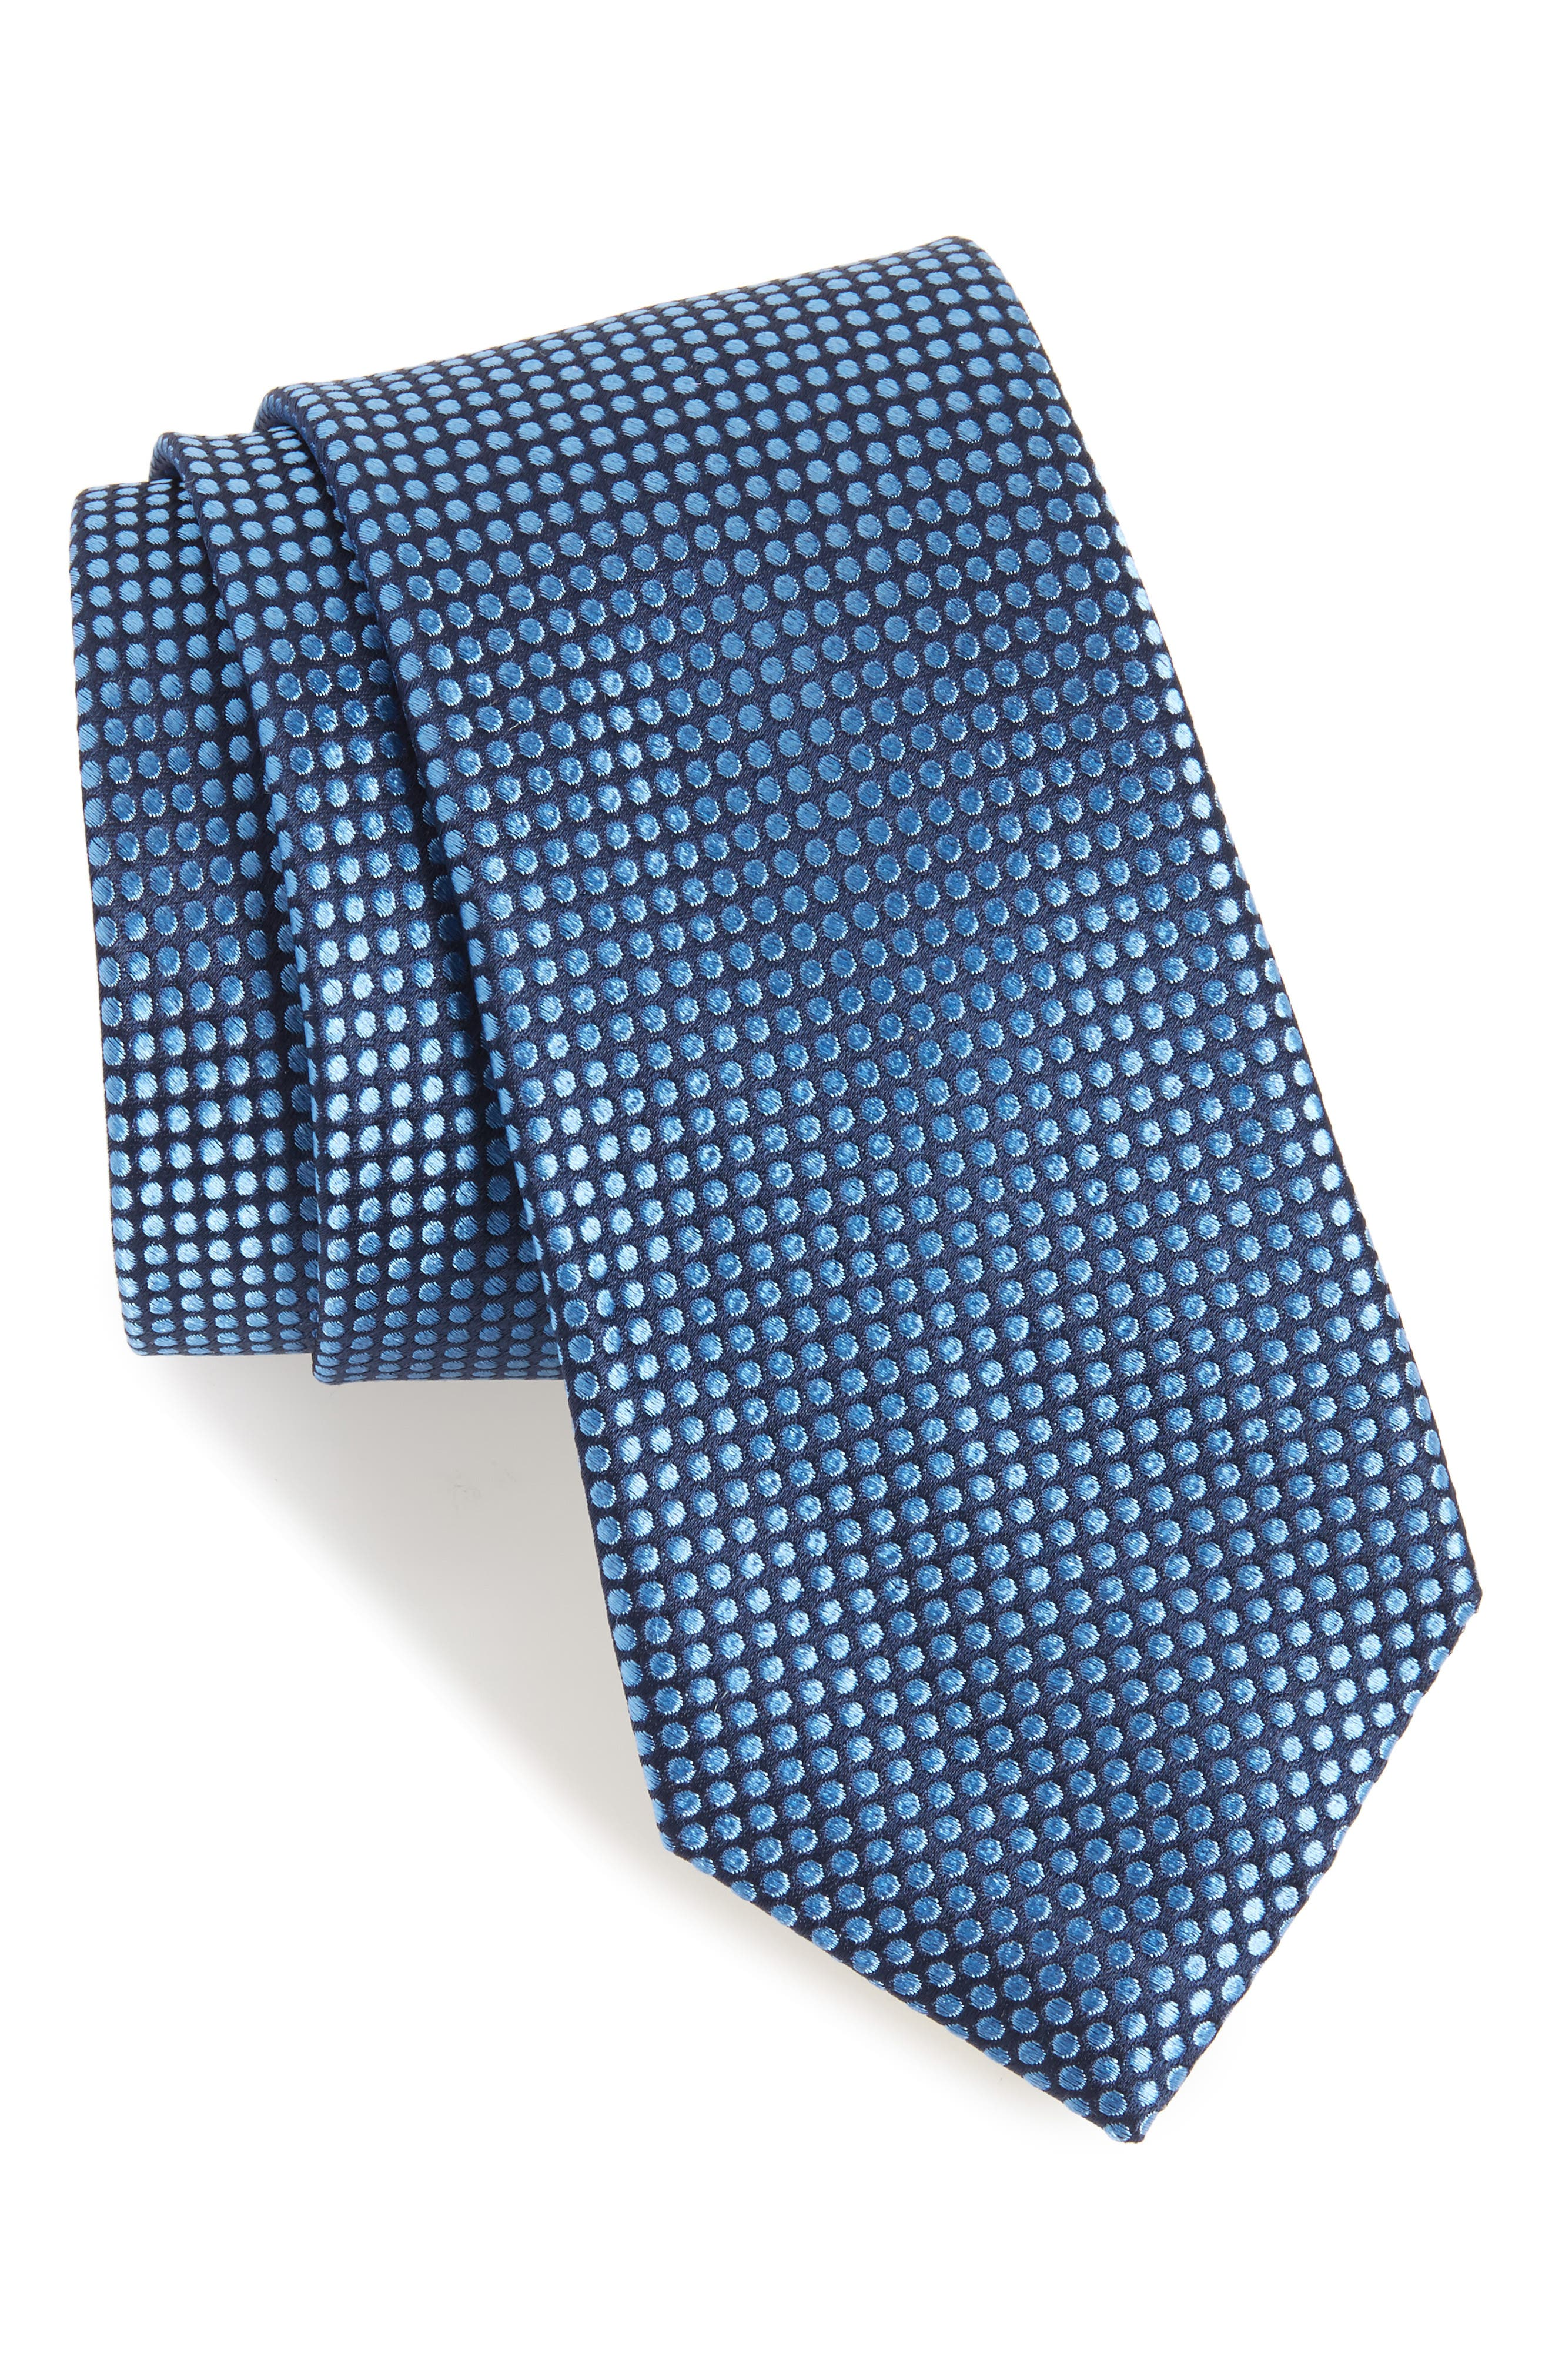 Alternate Image 1 Selected - Nordstrom Men's Shop Charlie Dots Silk Tie